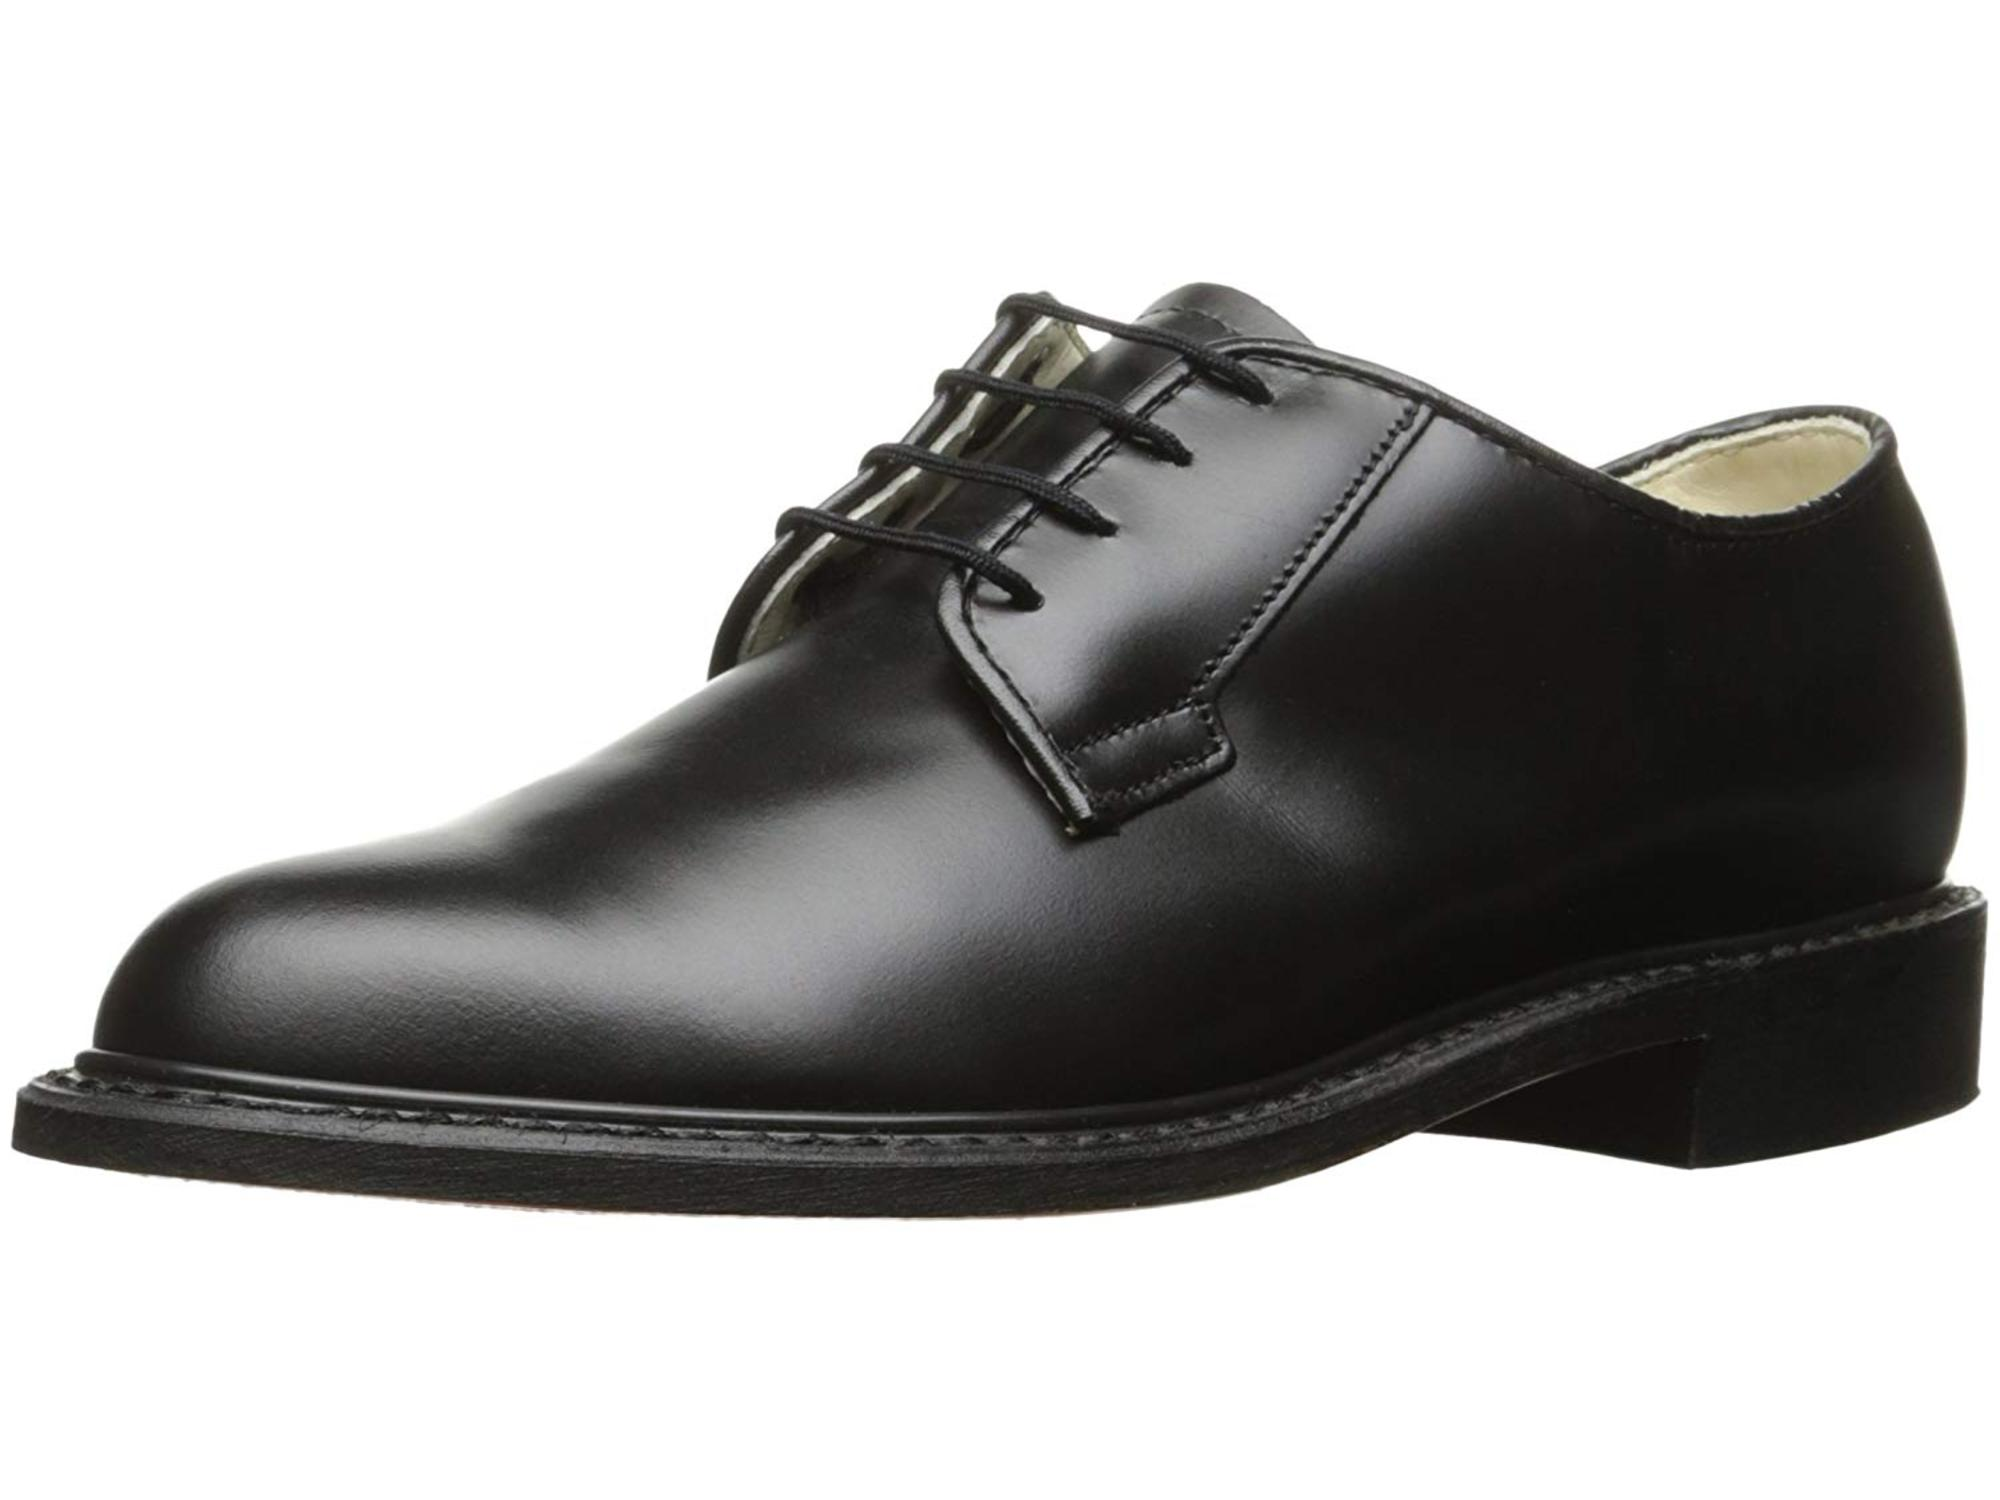 Bates - Bates Women's Navy Premier Oxford Uniform Dress Shoe, Black, Size  11.0 - Walmart.com - Walmart.com